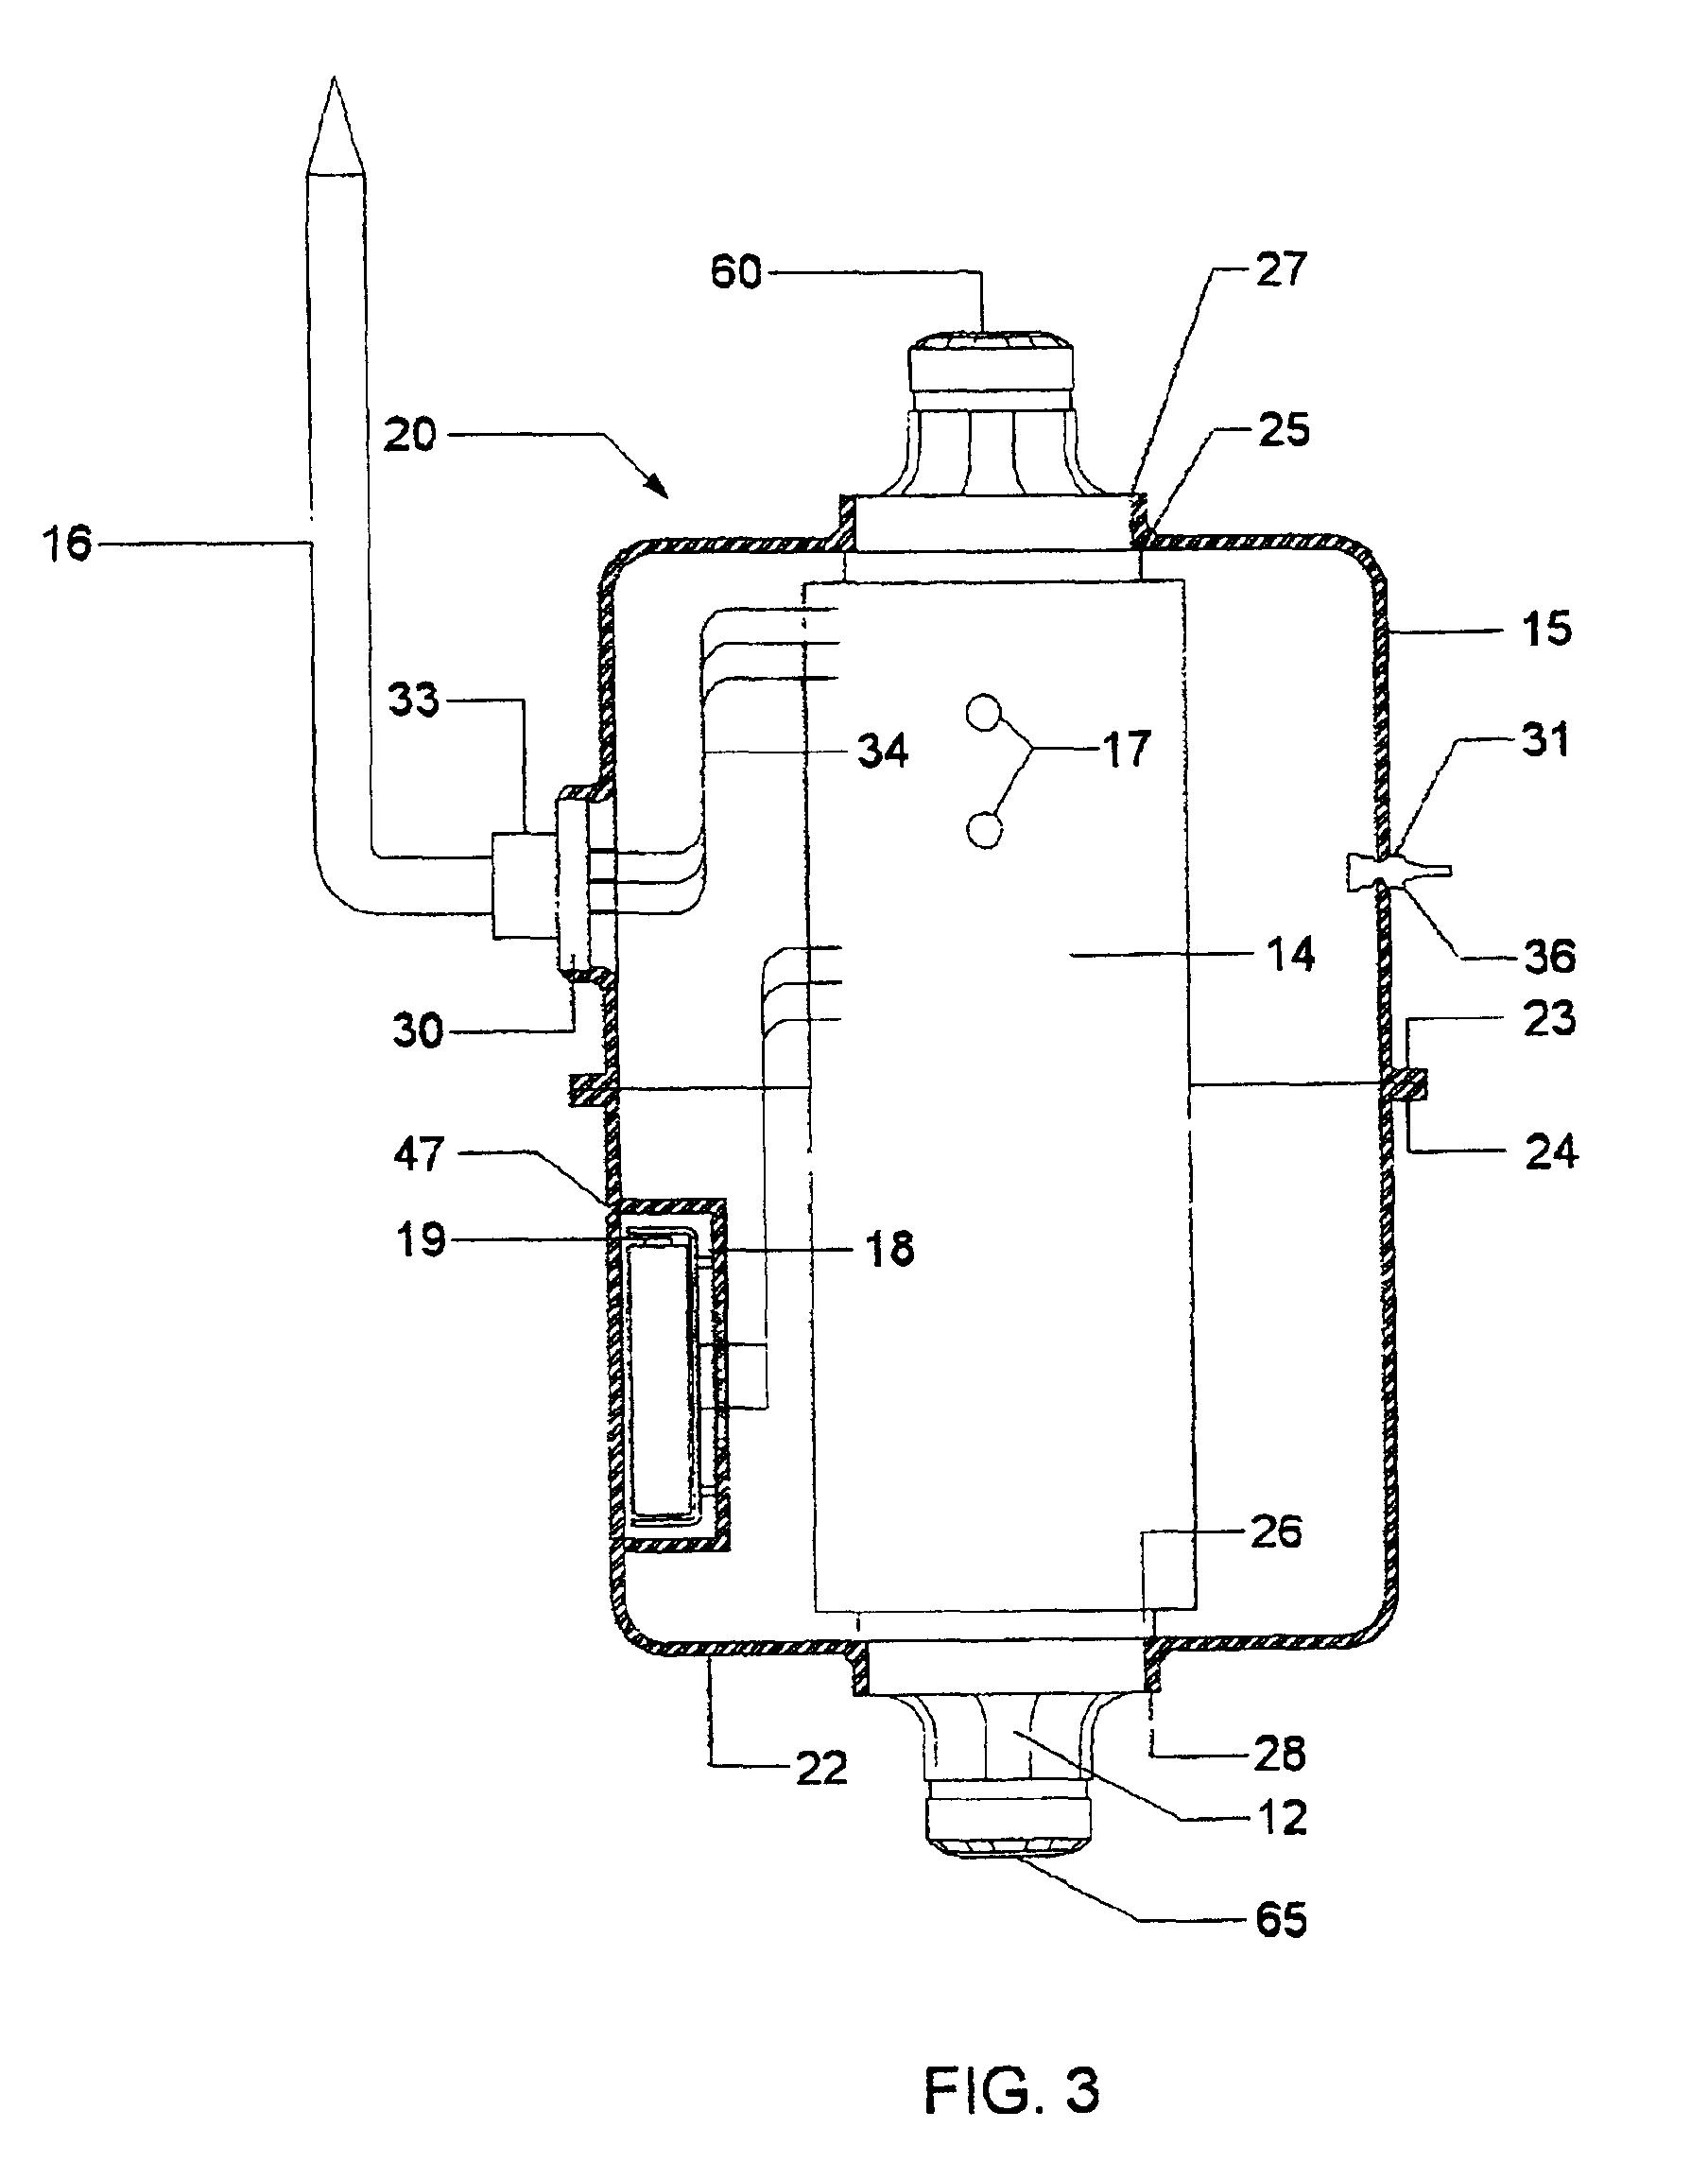 Mettler Toledo Load Cell Wiring Diagram : 39 Wiring